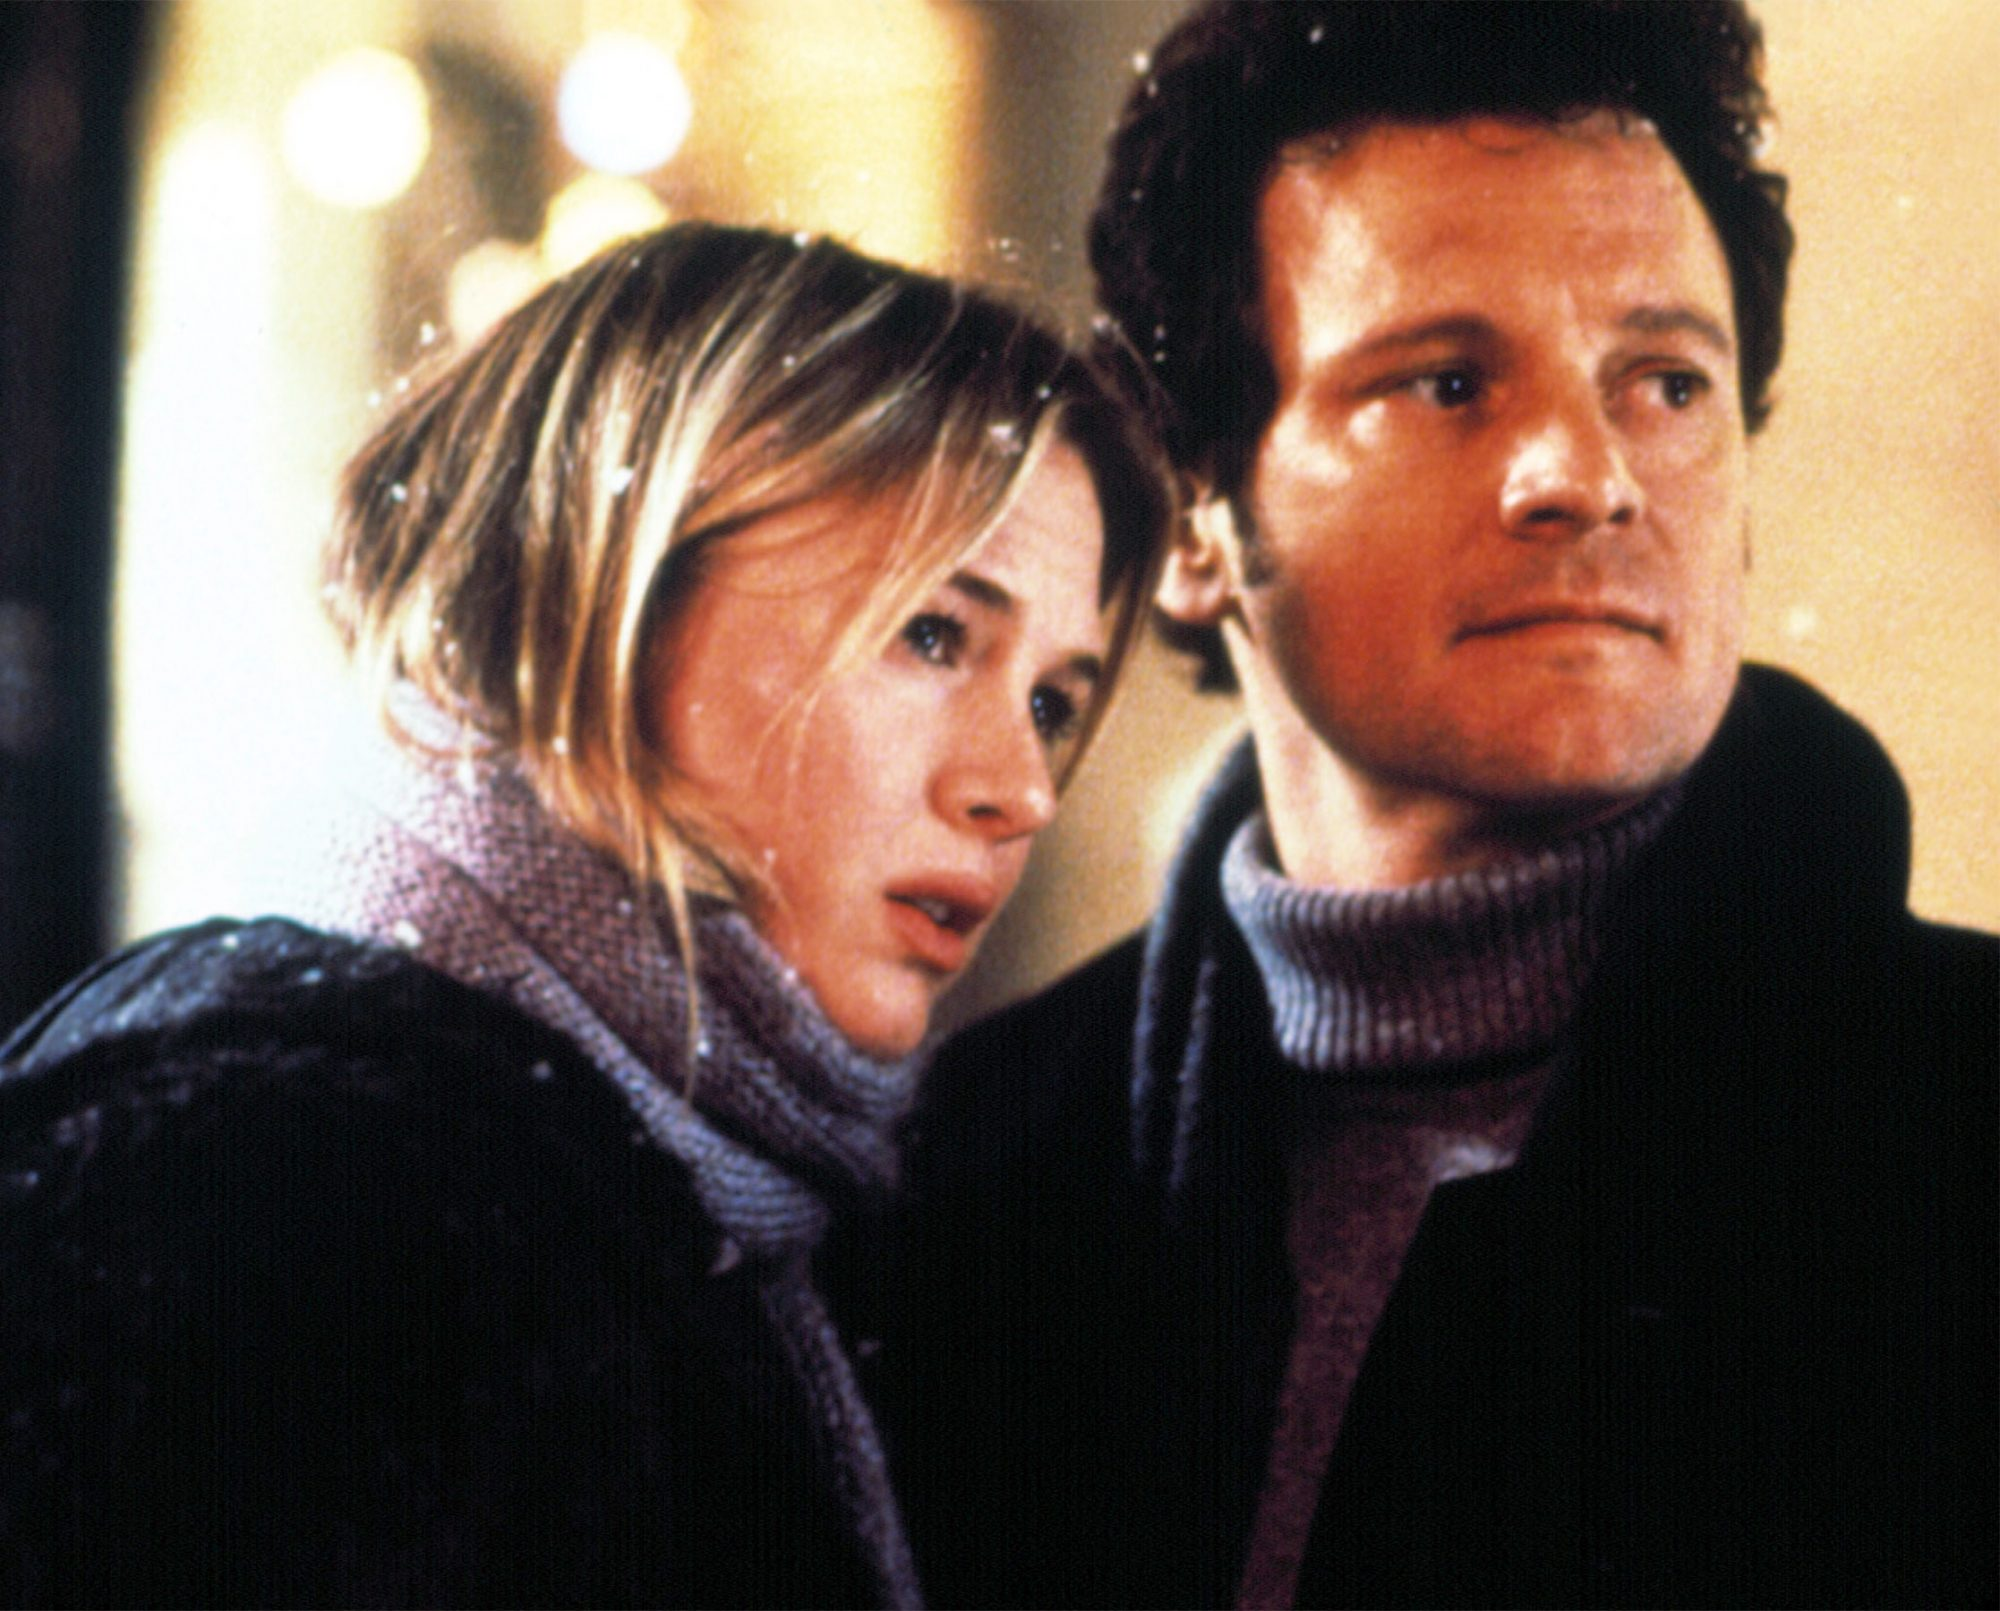 BRIDGET JONES'S DIARY, Renee Zellweger, Colin Firth, 2001